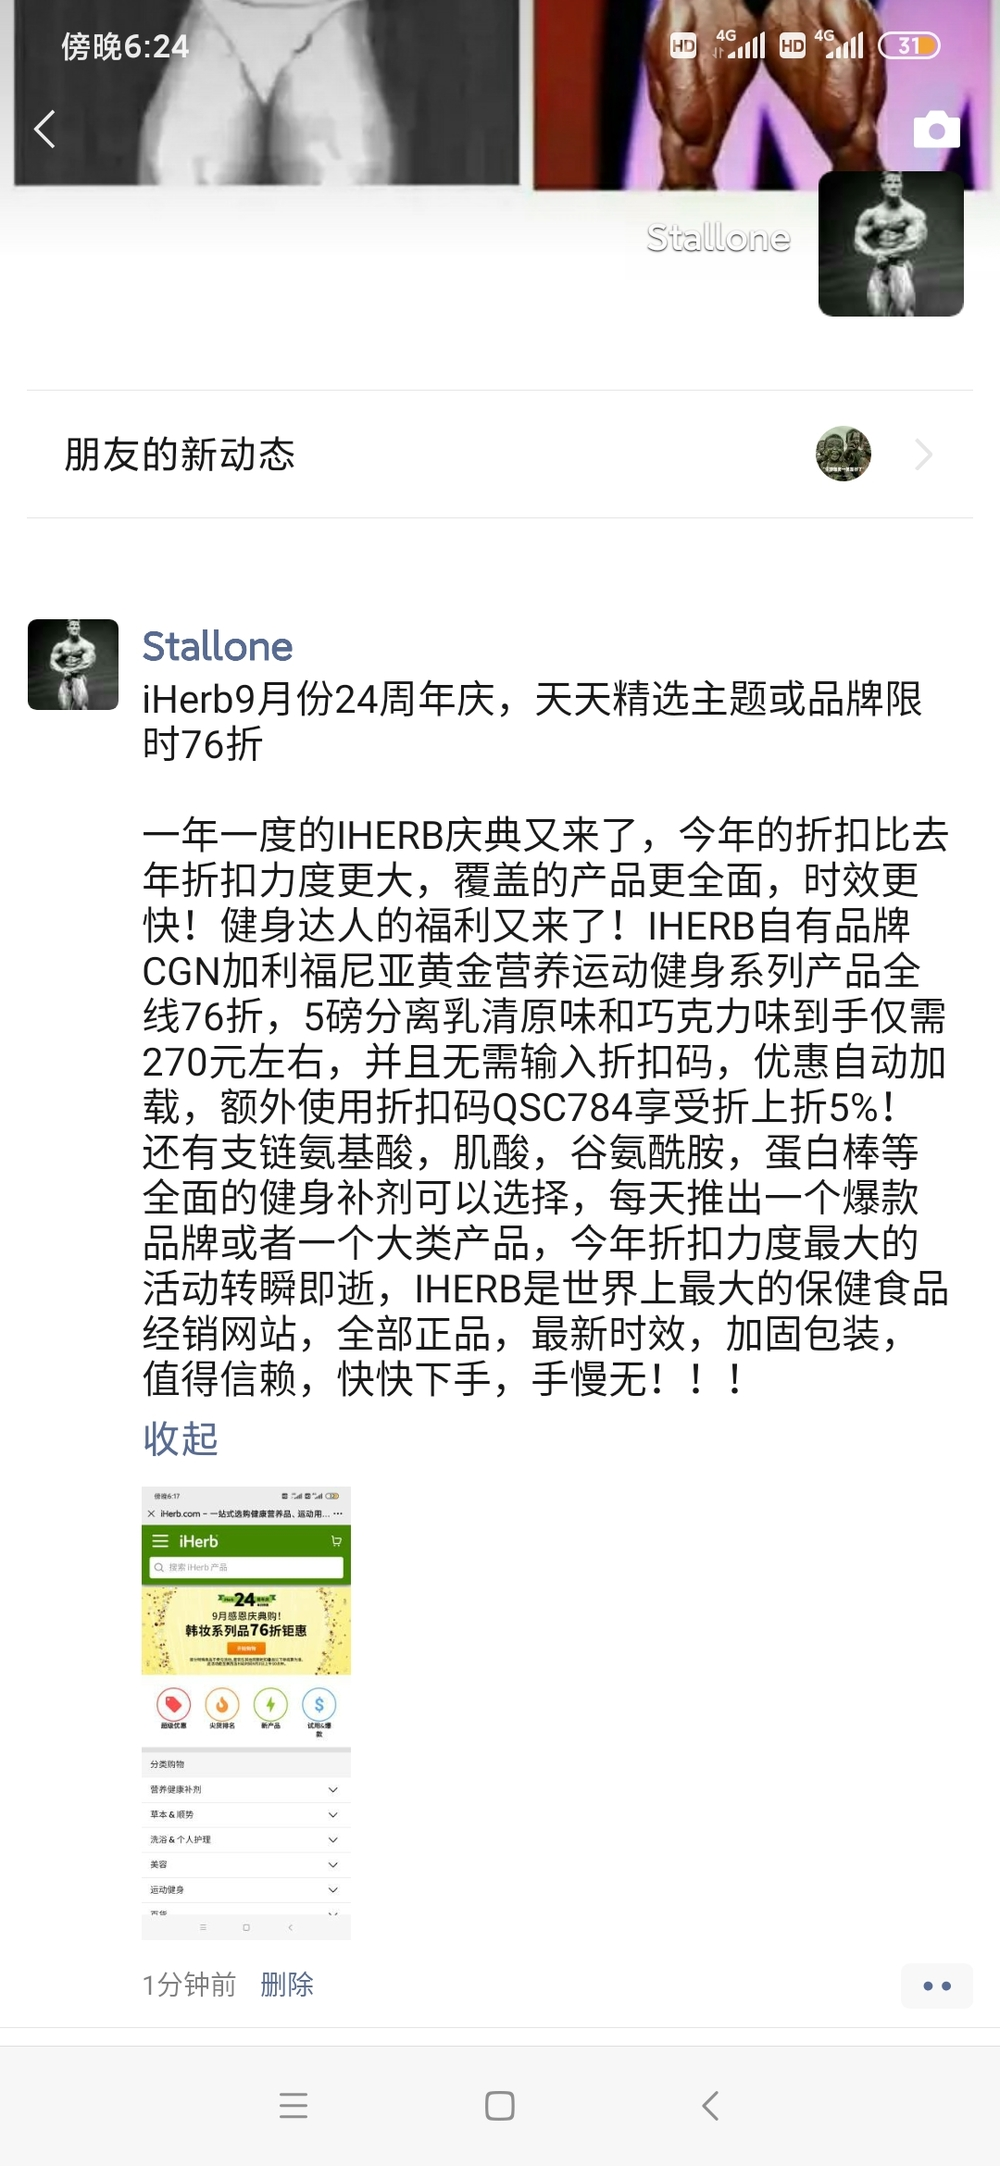 Screenshot_2020-09-03-18-24-47-808_com.tencent.mm.jpg